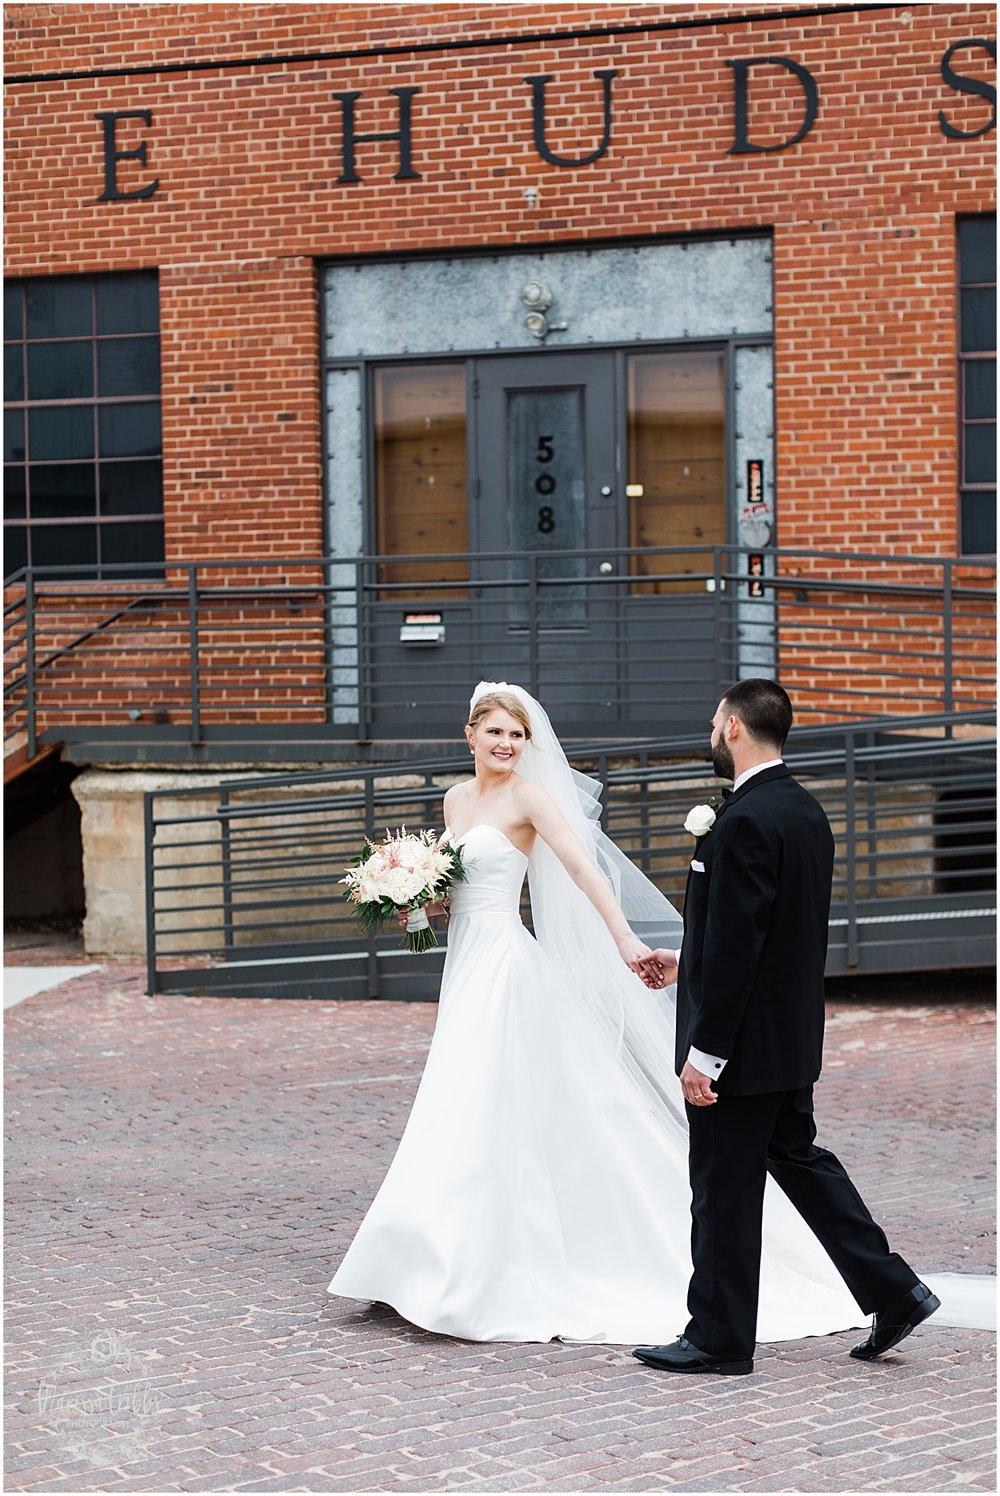 ABBY & CHARLIE WEDDING   THE HUDSON EVENT SPACE WEDDING   MARISSA CRIBBS PHOTOGRAPHY_7511.jpg